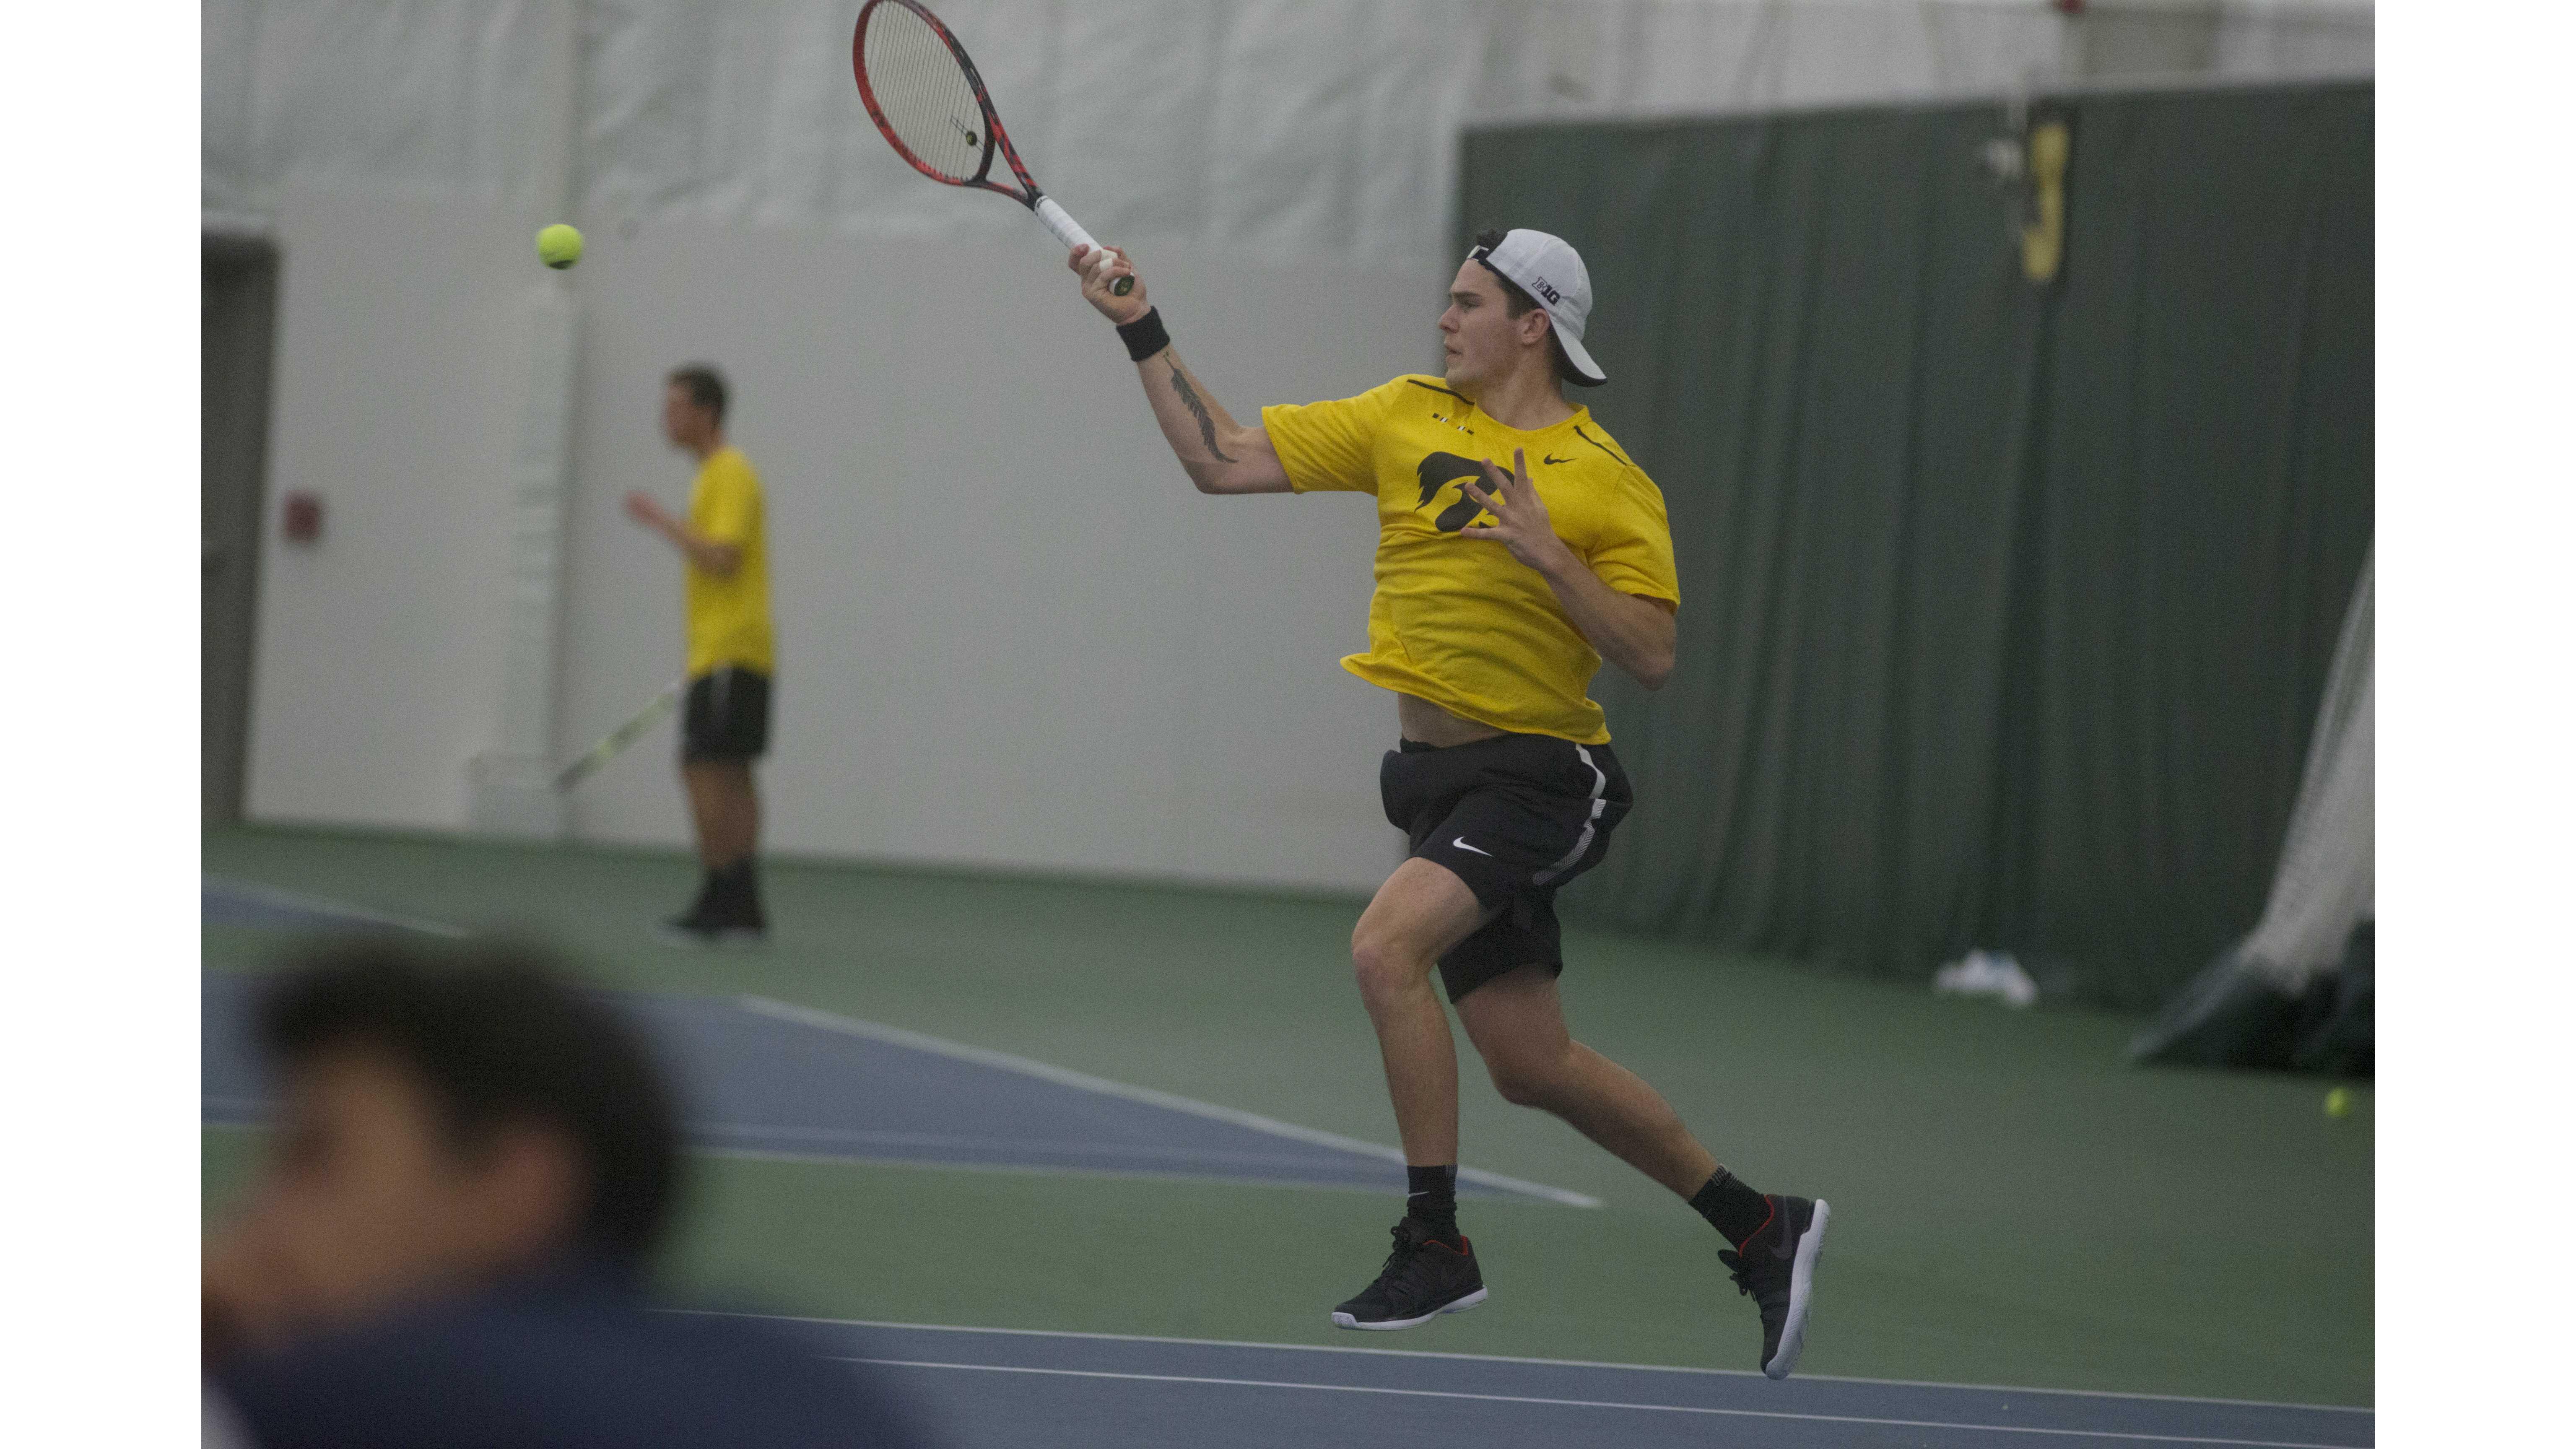 Three wins, one loss for Hawkeye tennis